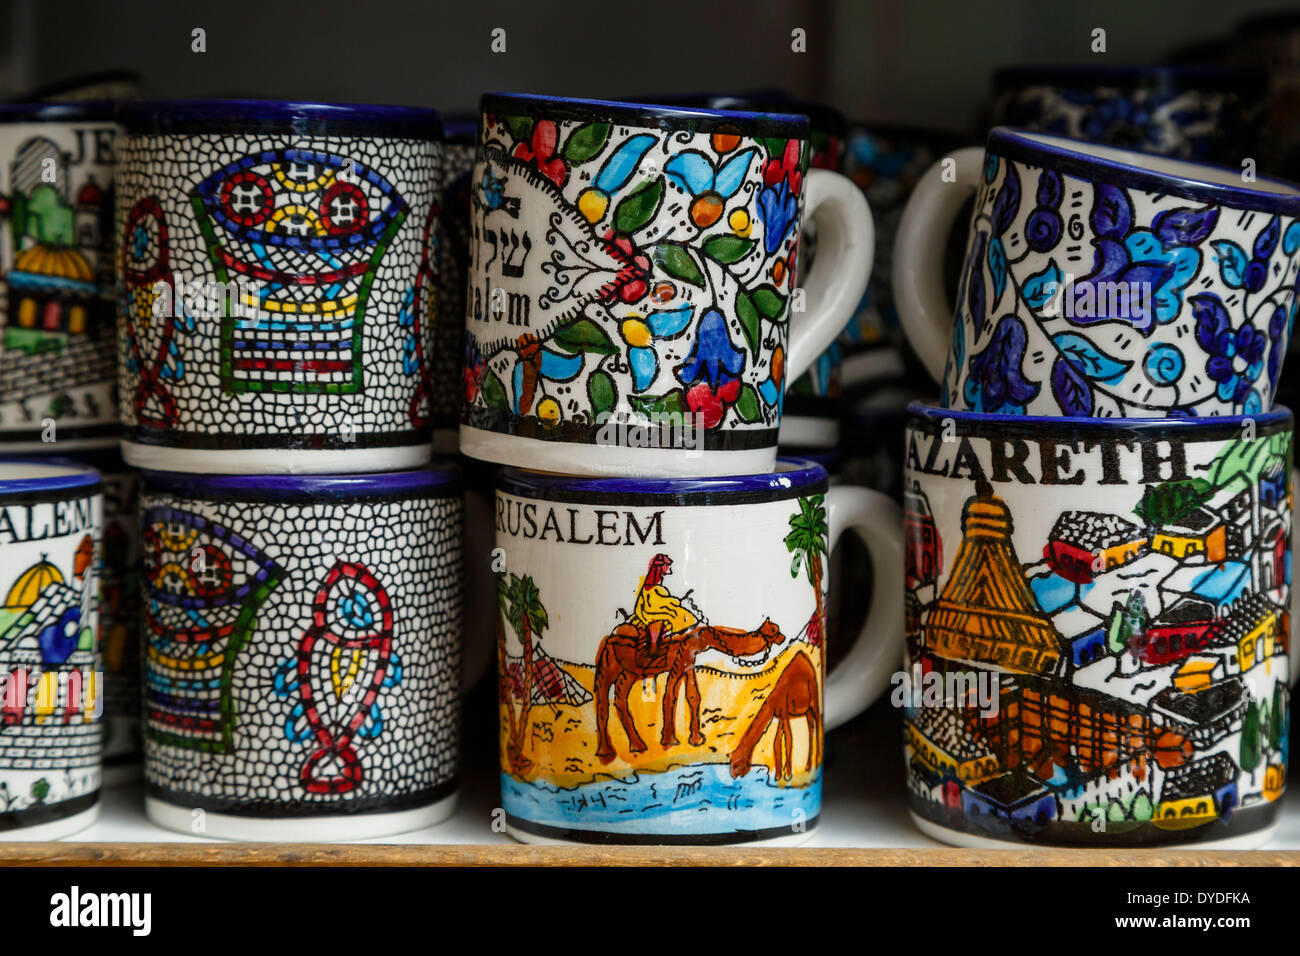 Pottery souvenirs, Nazareth, lower Galilee region, Israel. - Stock Image